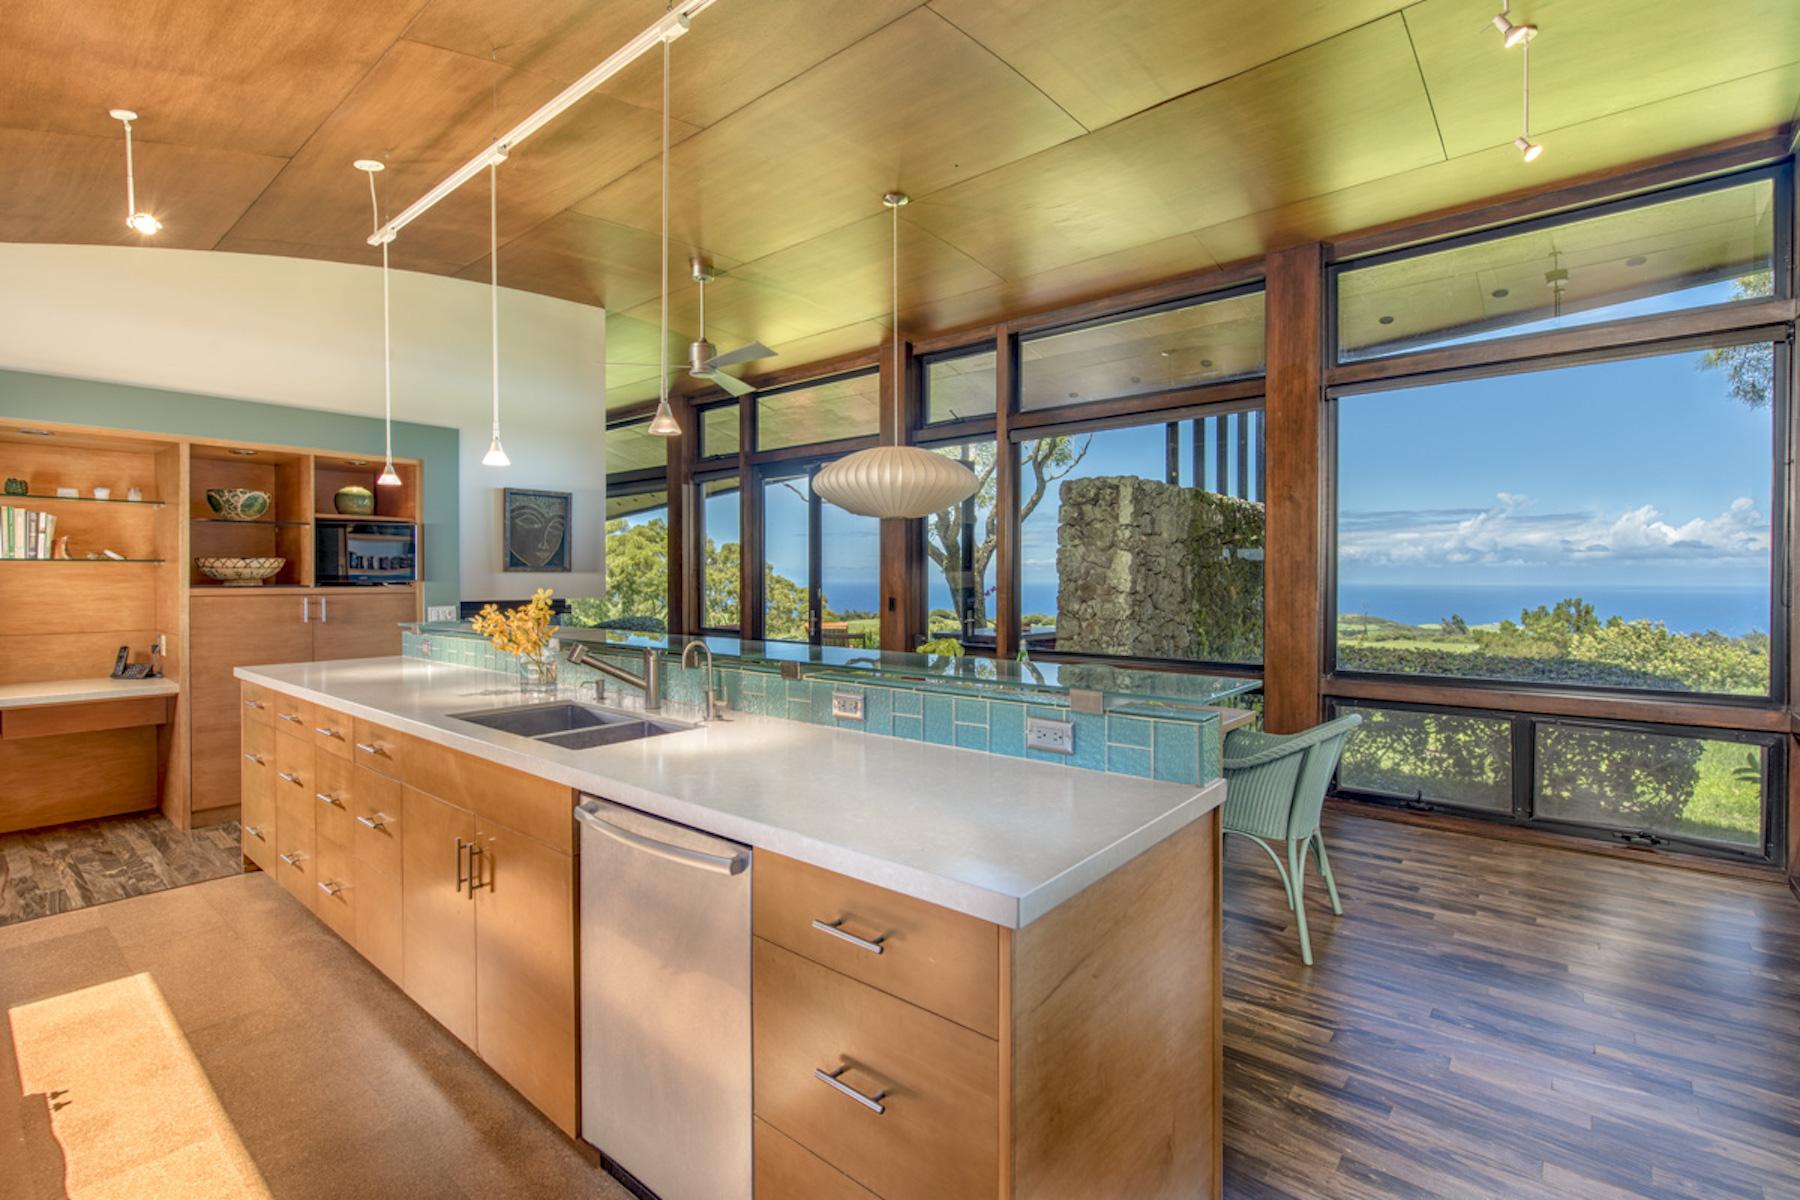 Single Family Home for Sale at Maliu Ridge II 56-3163 Puu Mamo Dr. Hawi, Hawaii 96719 United States